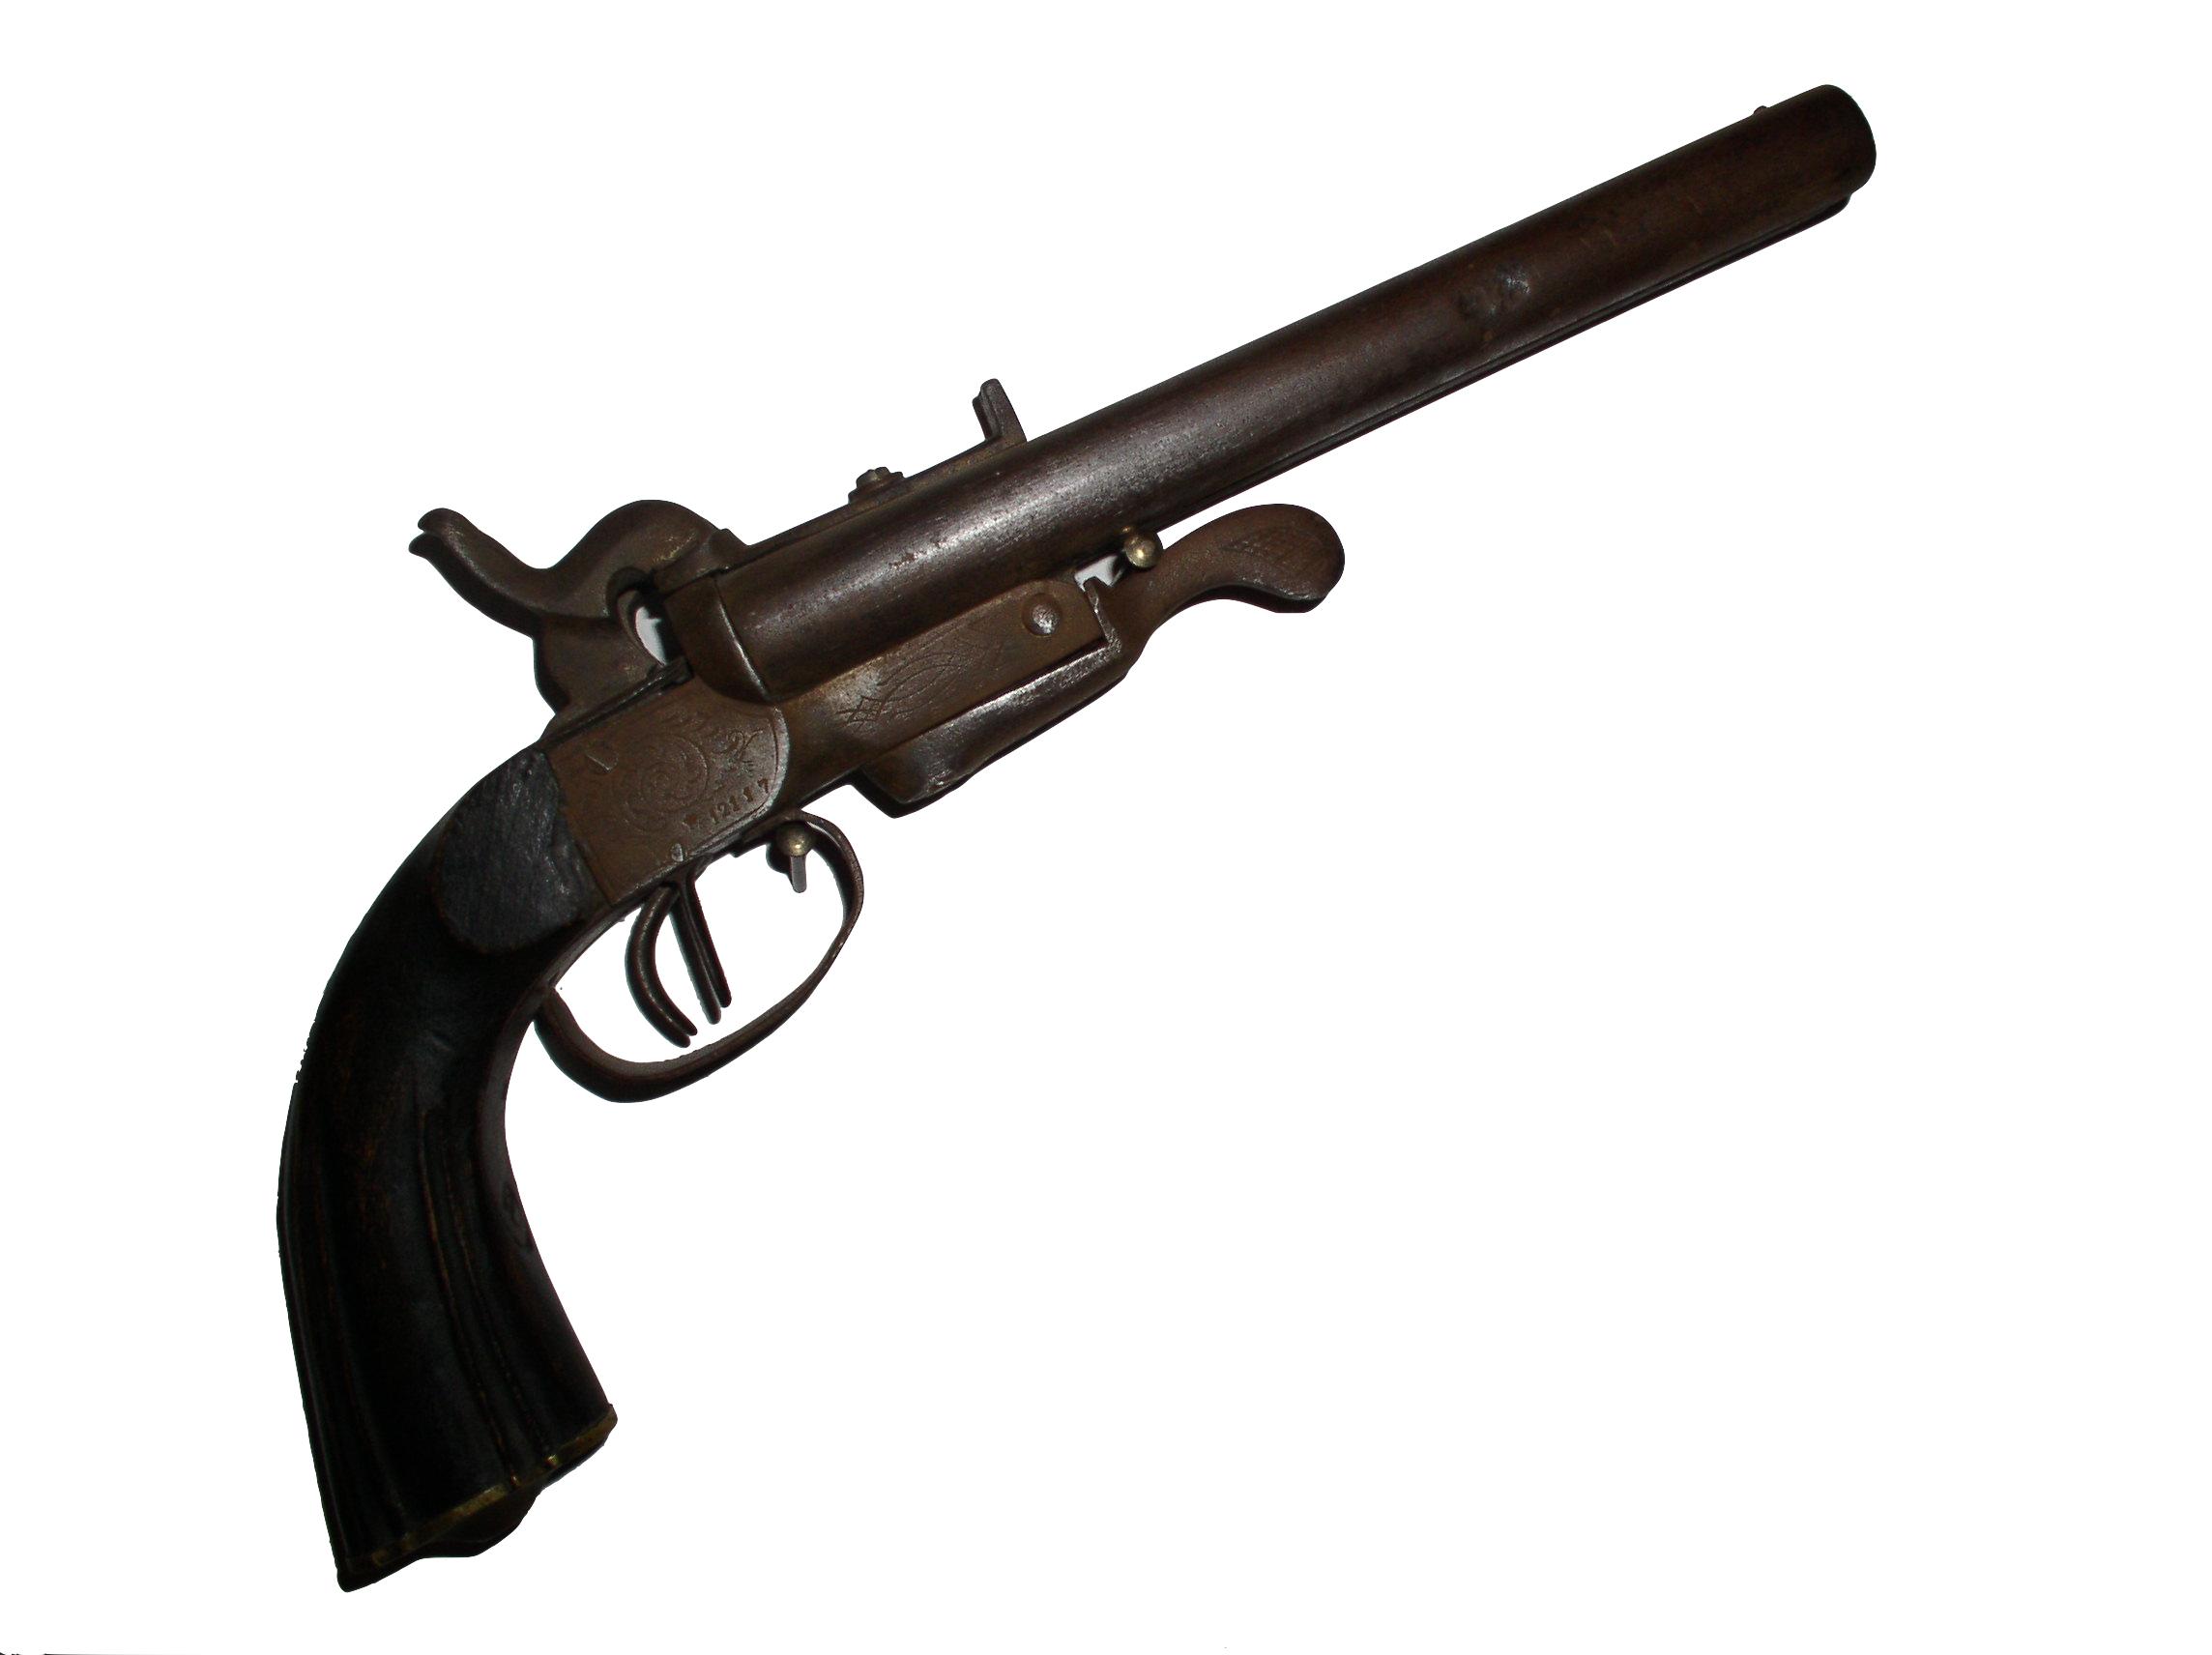 Resultado de imagem para arma de fogo garrucha